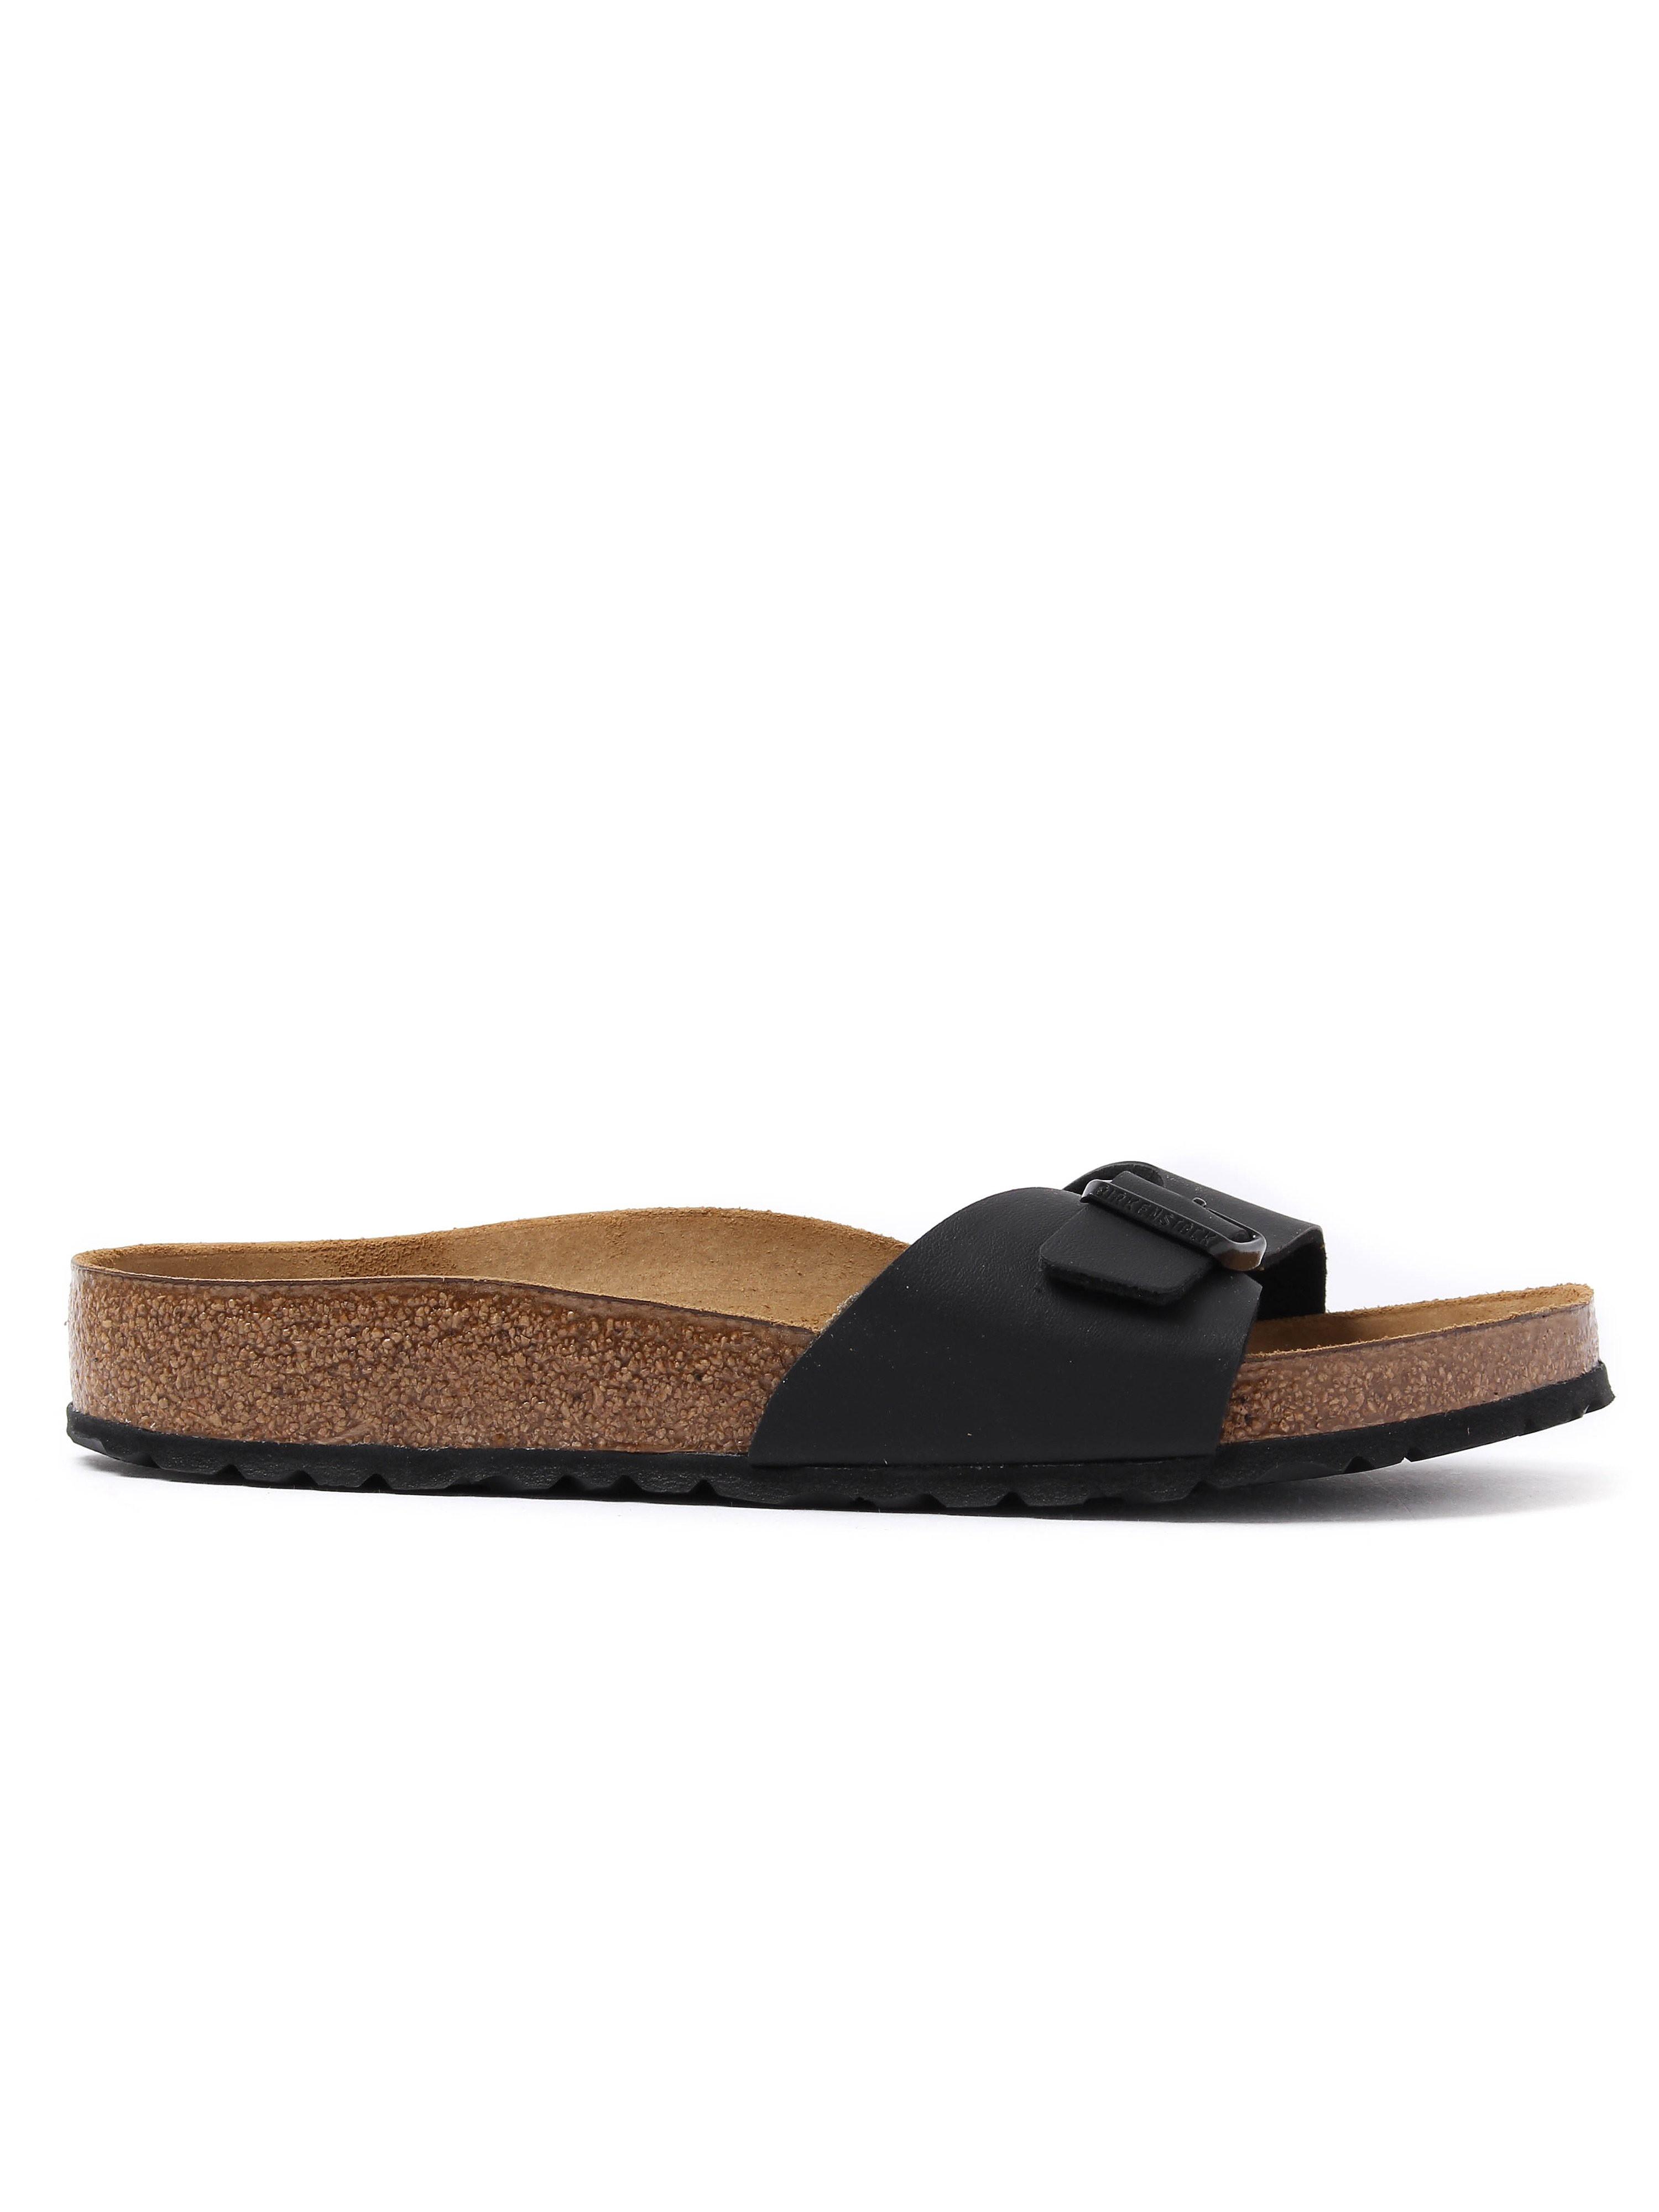 Birkenstock Women's Madrid Single Strap Sandals - Black